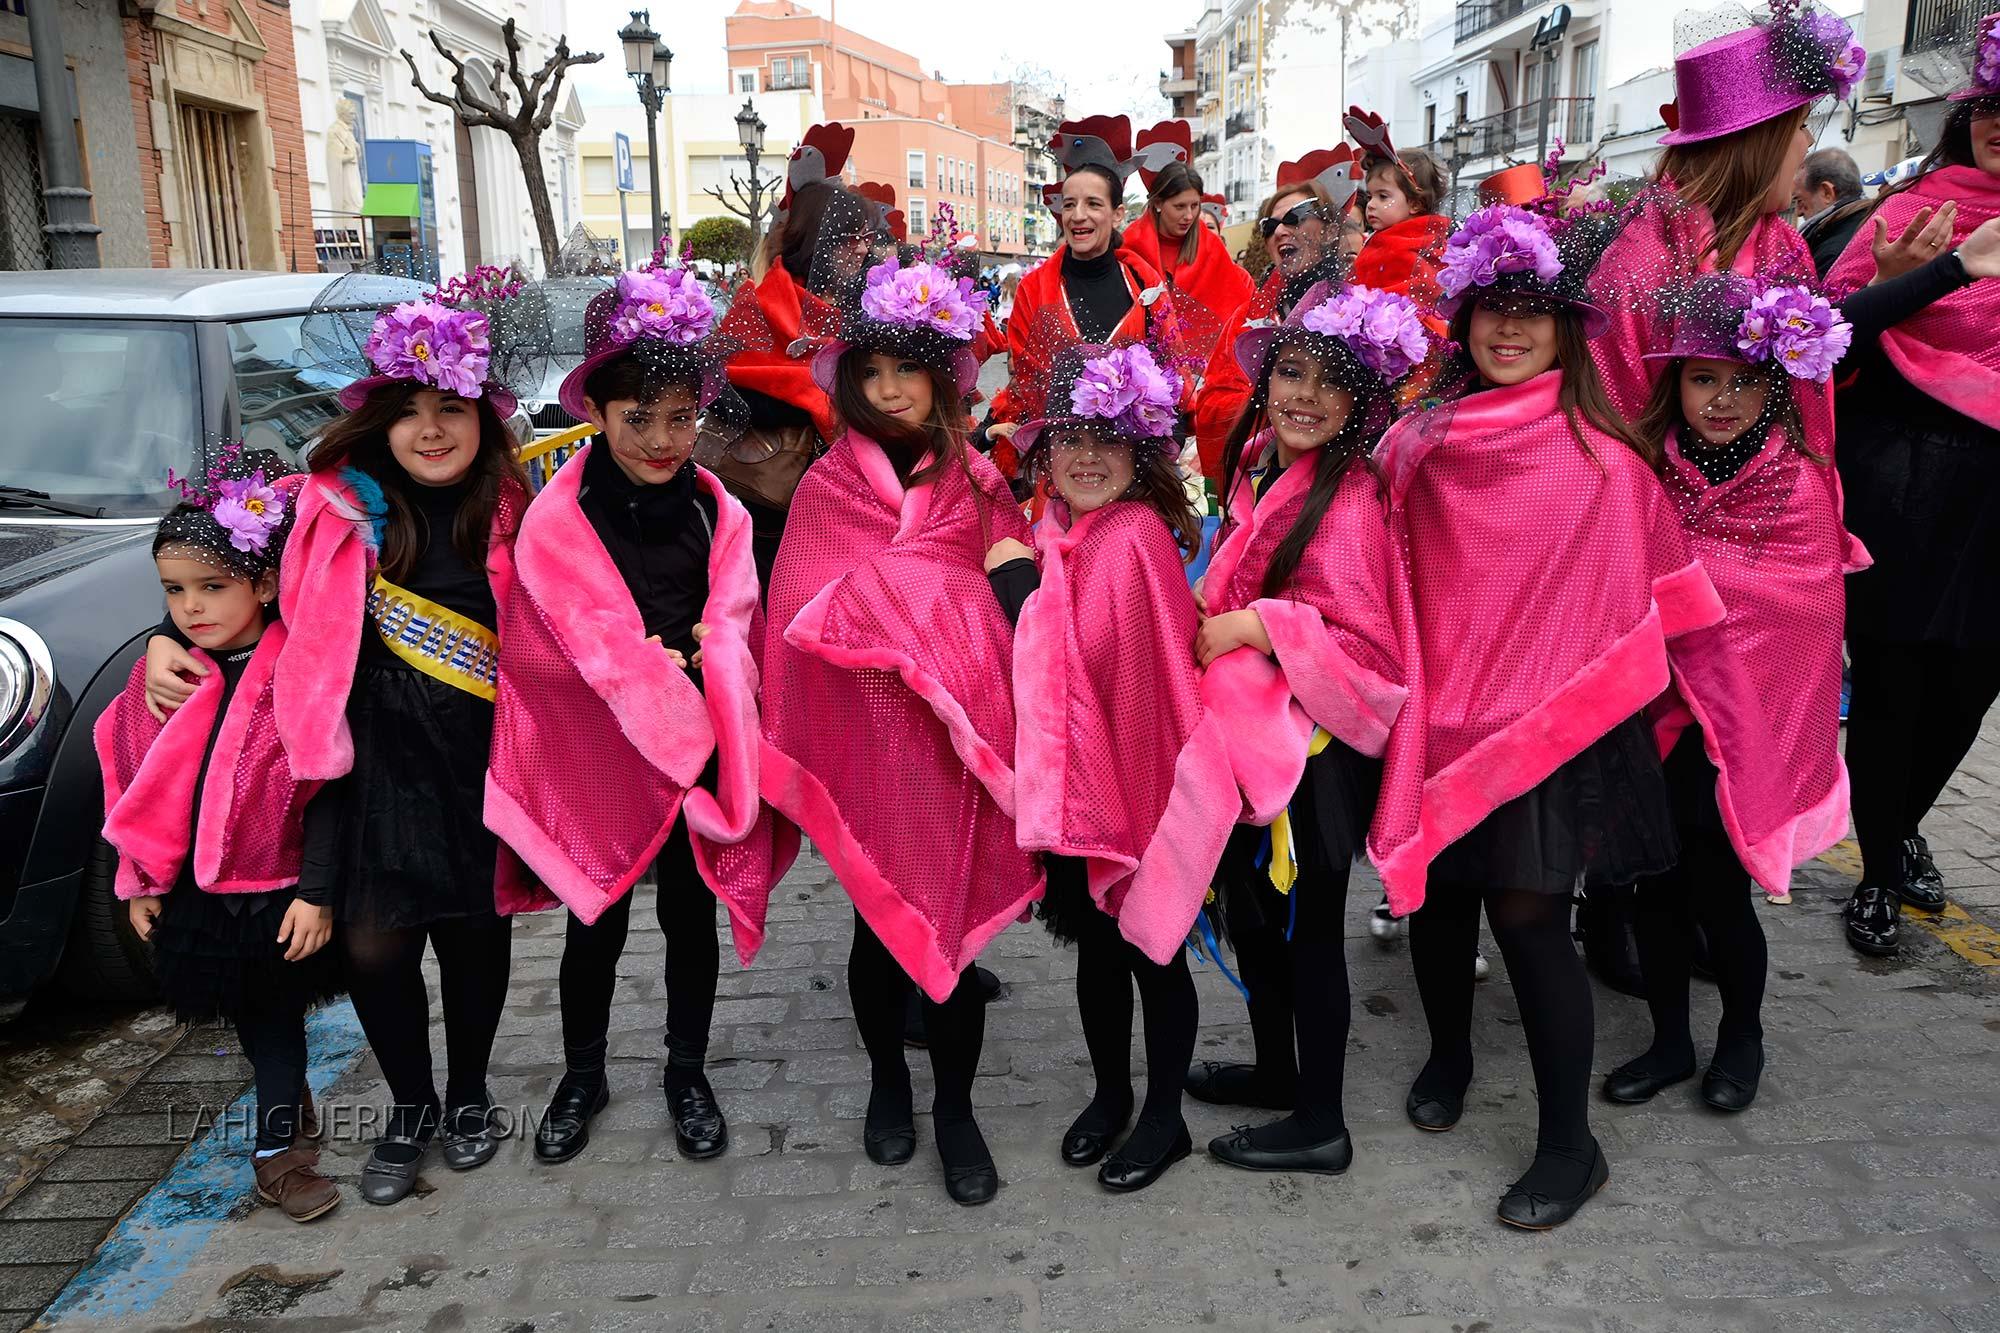 Cabalgata infantil de viudas carnaval de Isla cristina 2016 _DSC1871